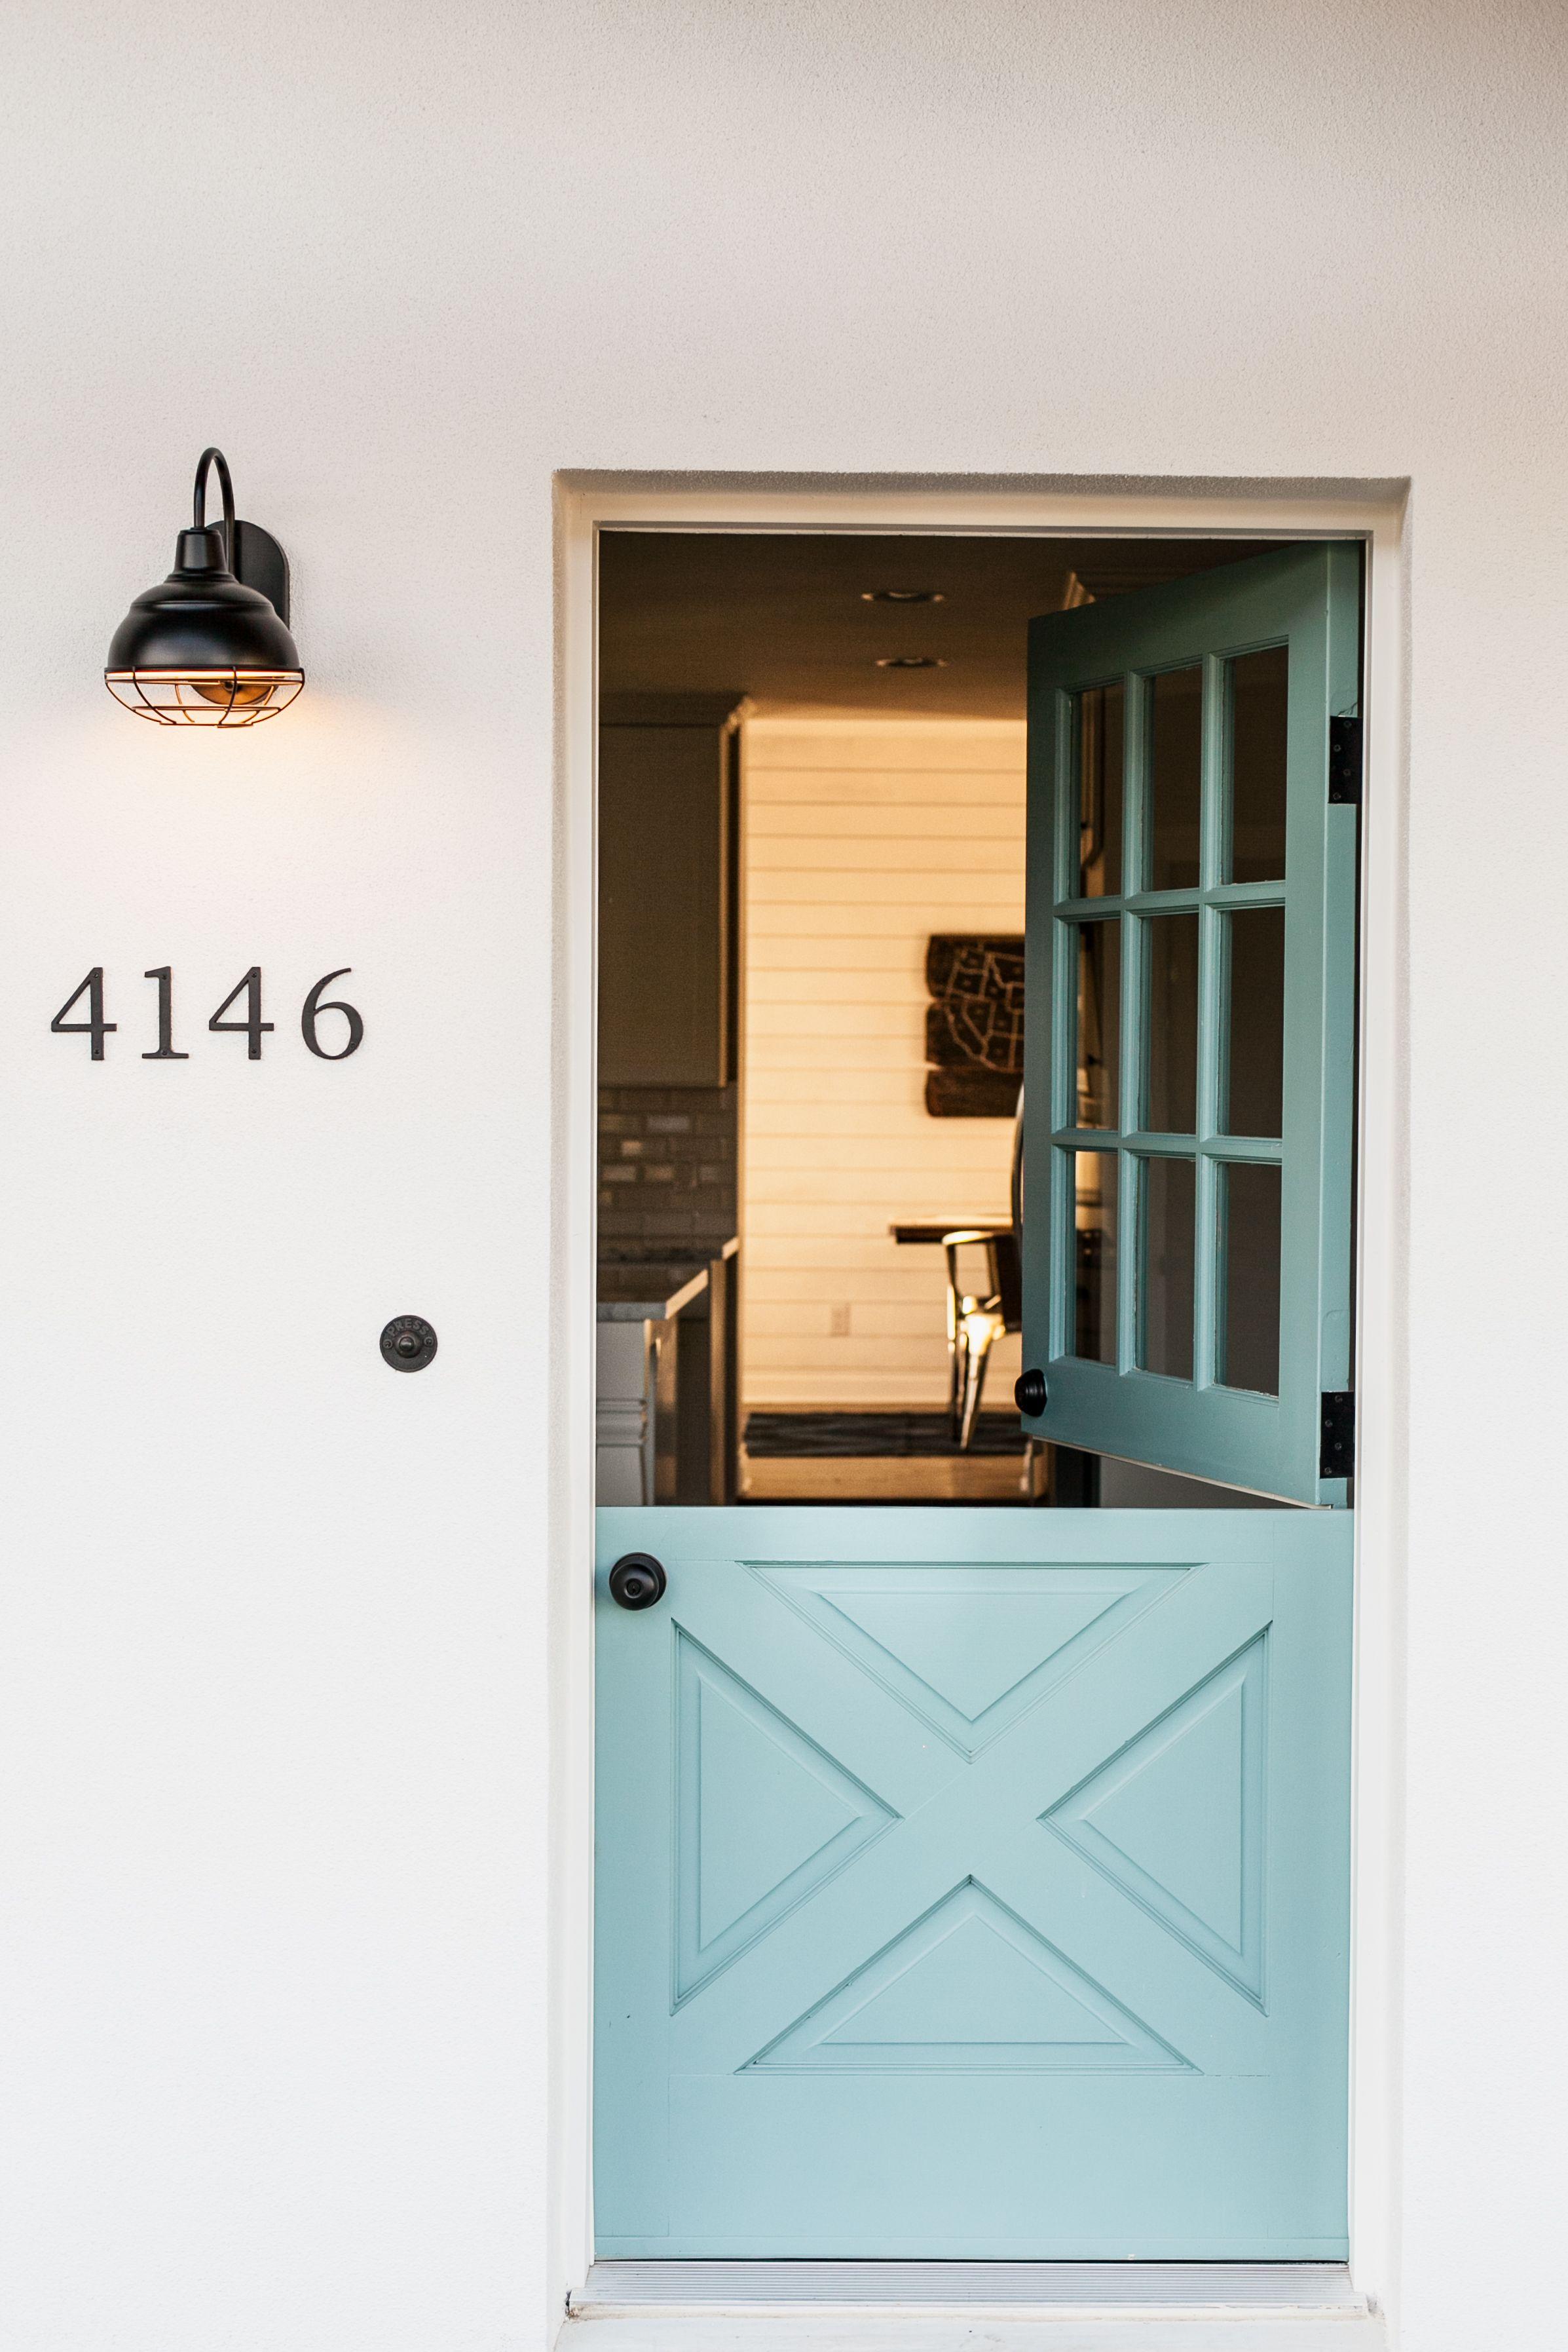 org sale door interior doors handballtunisie lowes forwardcapital for dutch l grand